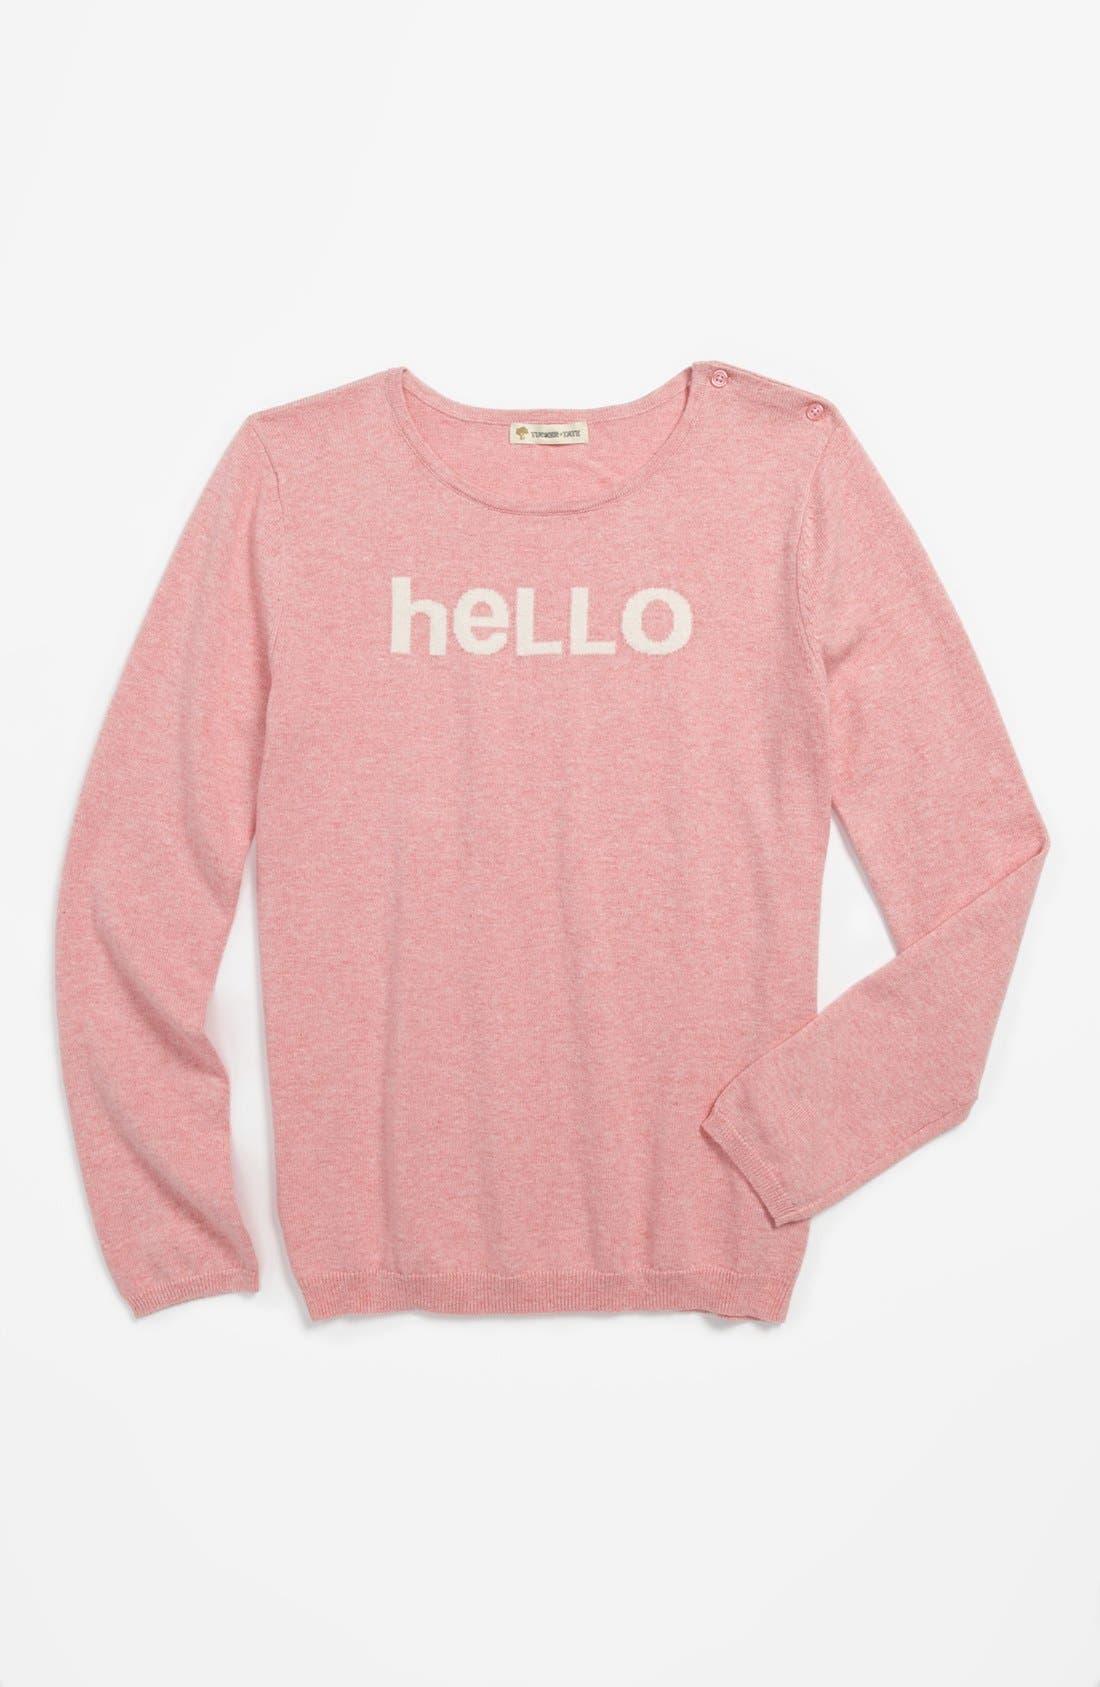 Alternate Image 1 Selected - Tucker + Tate 'Alexa' Intarsia Cotton & Cashmere Sweater (Big Girls)